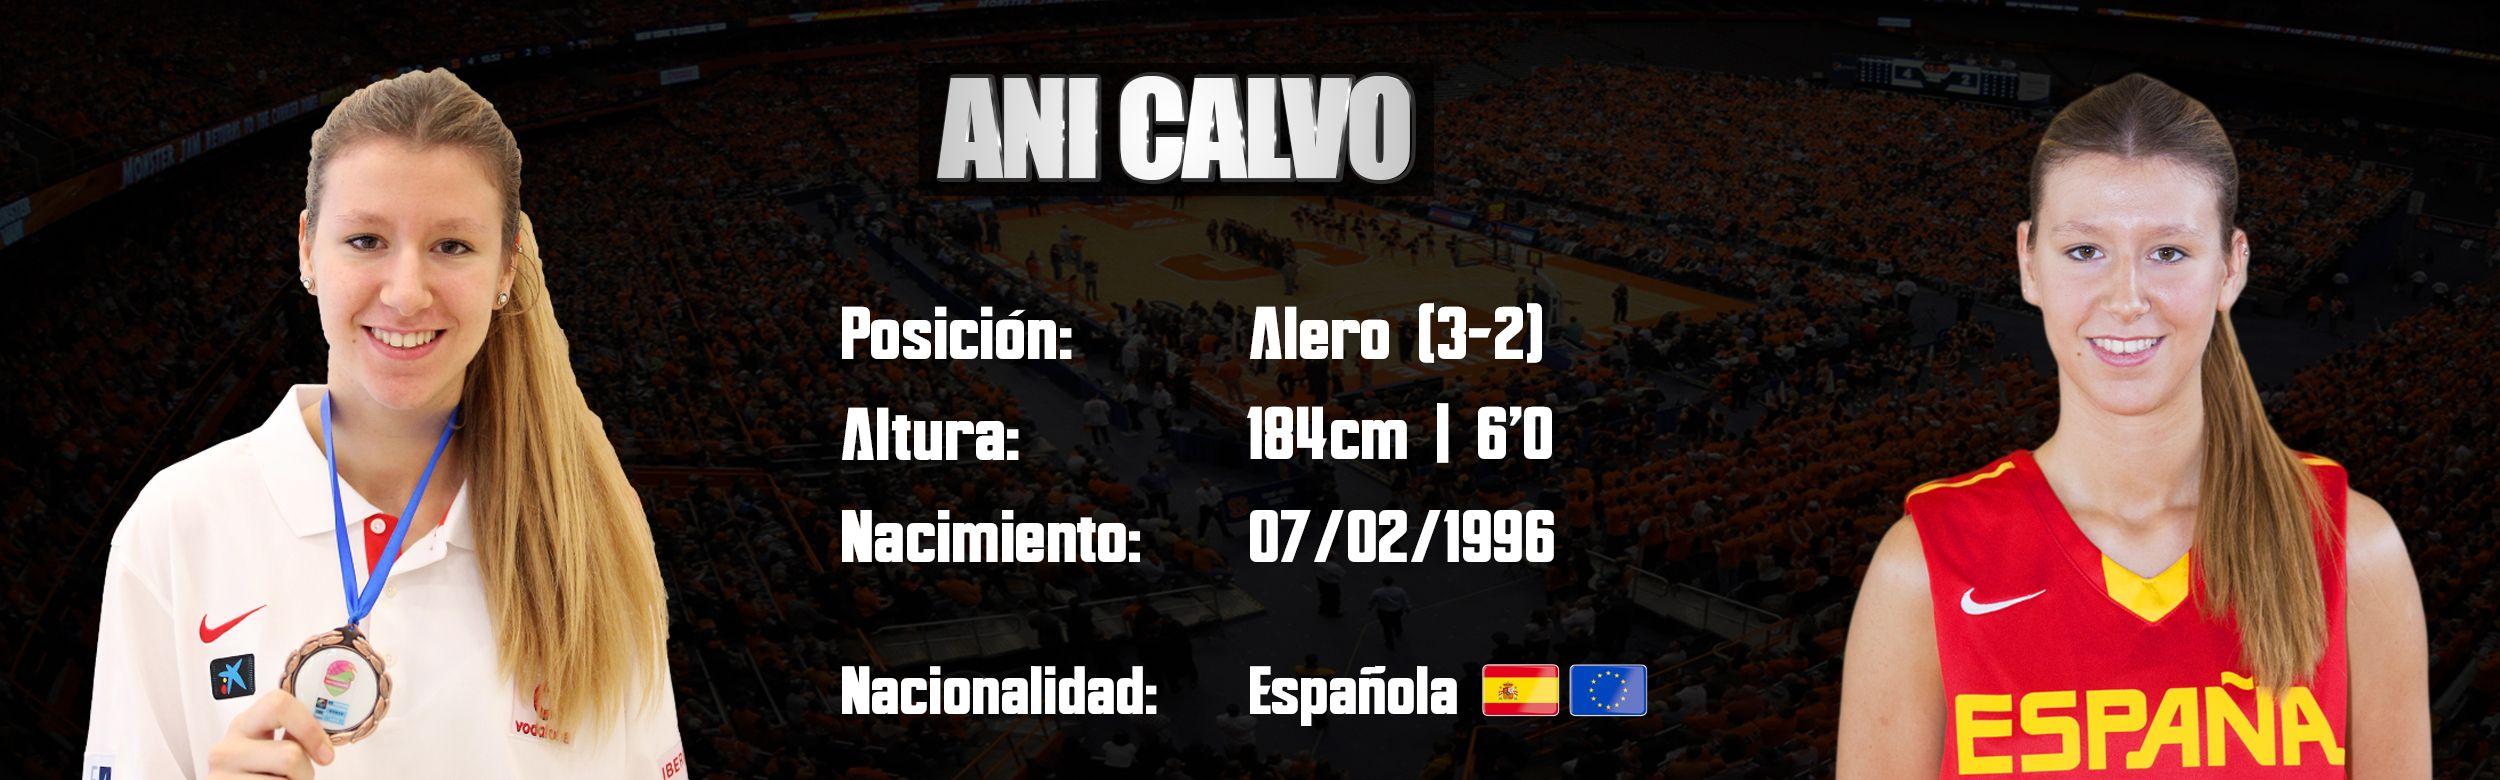 Ani Calvo